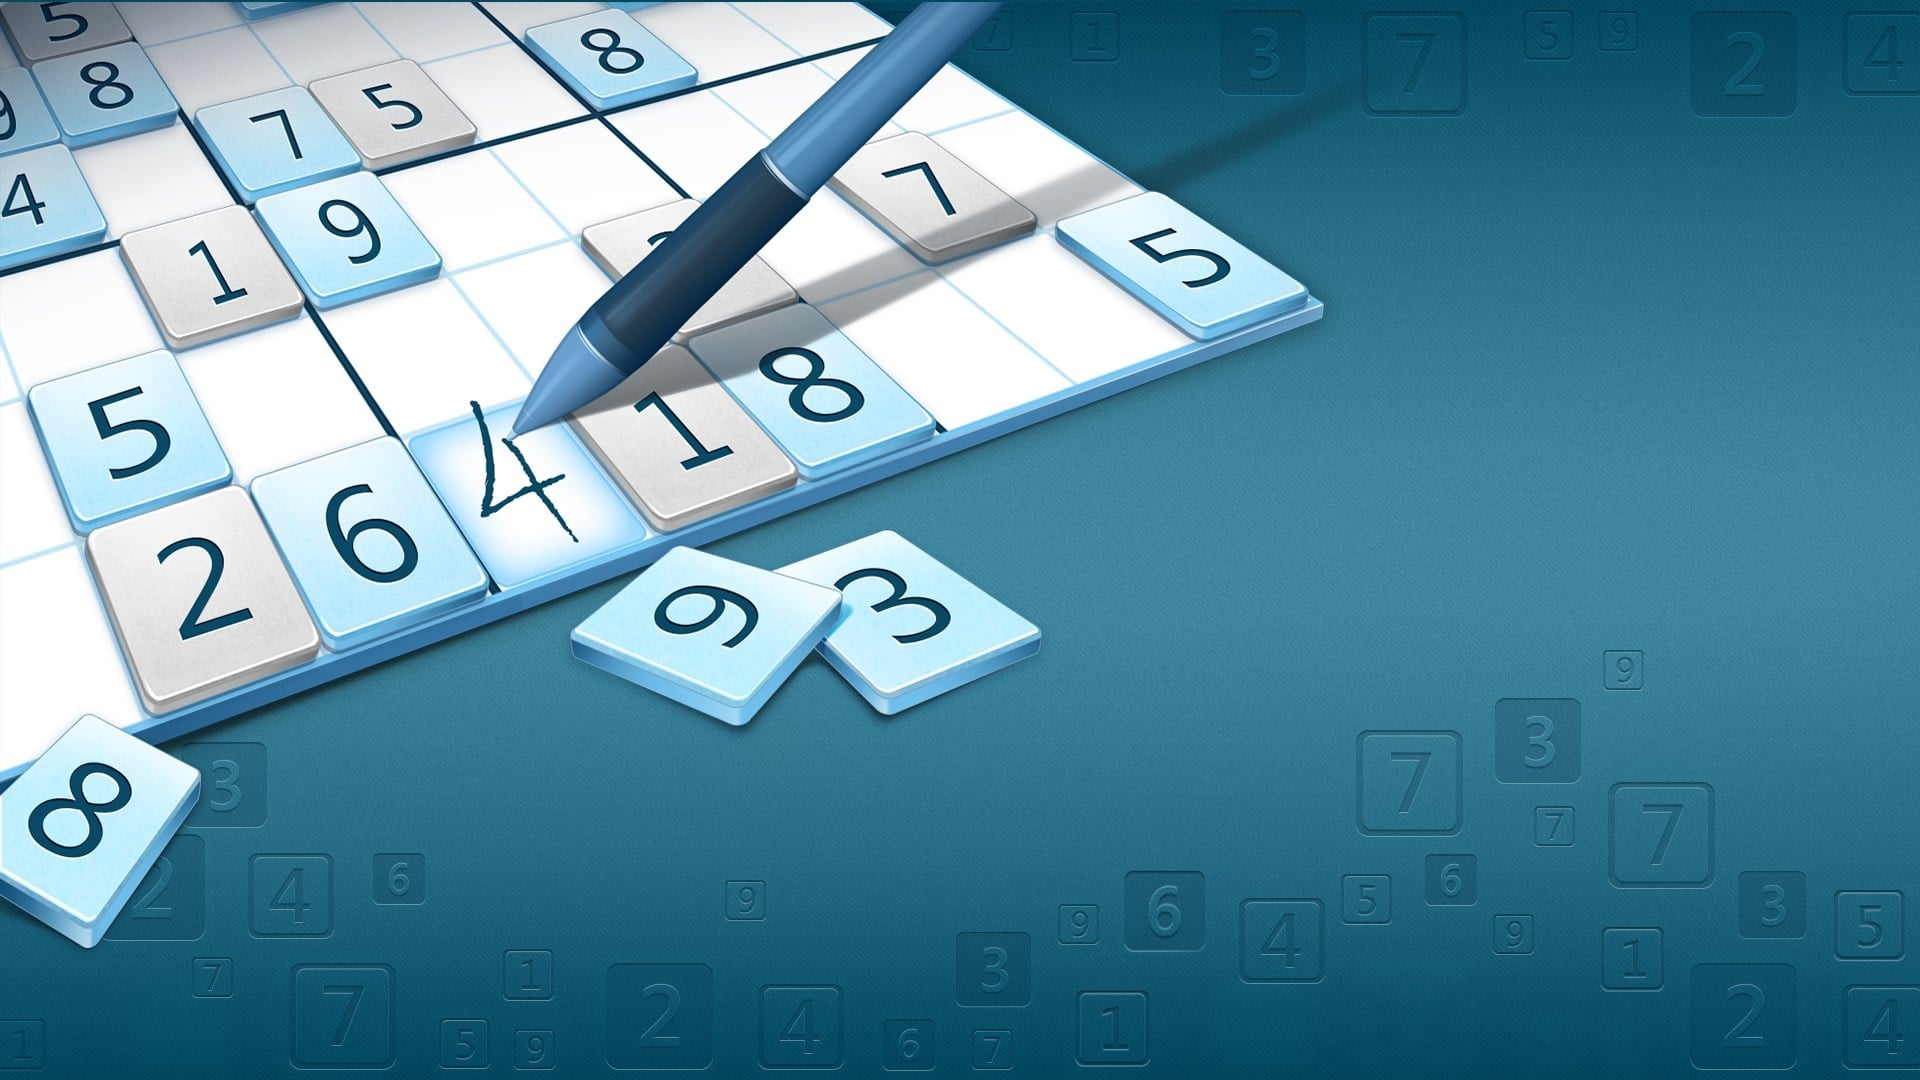 Microsoft Sudoku (Win 10) Achievements